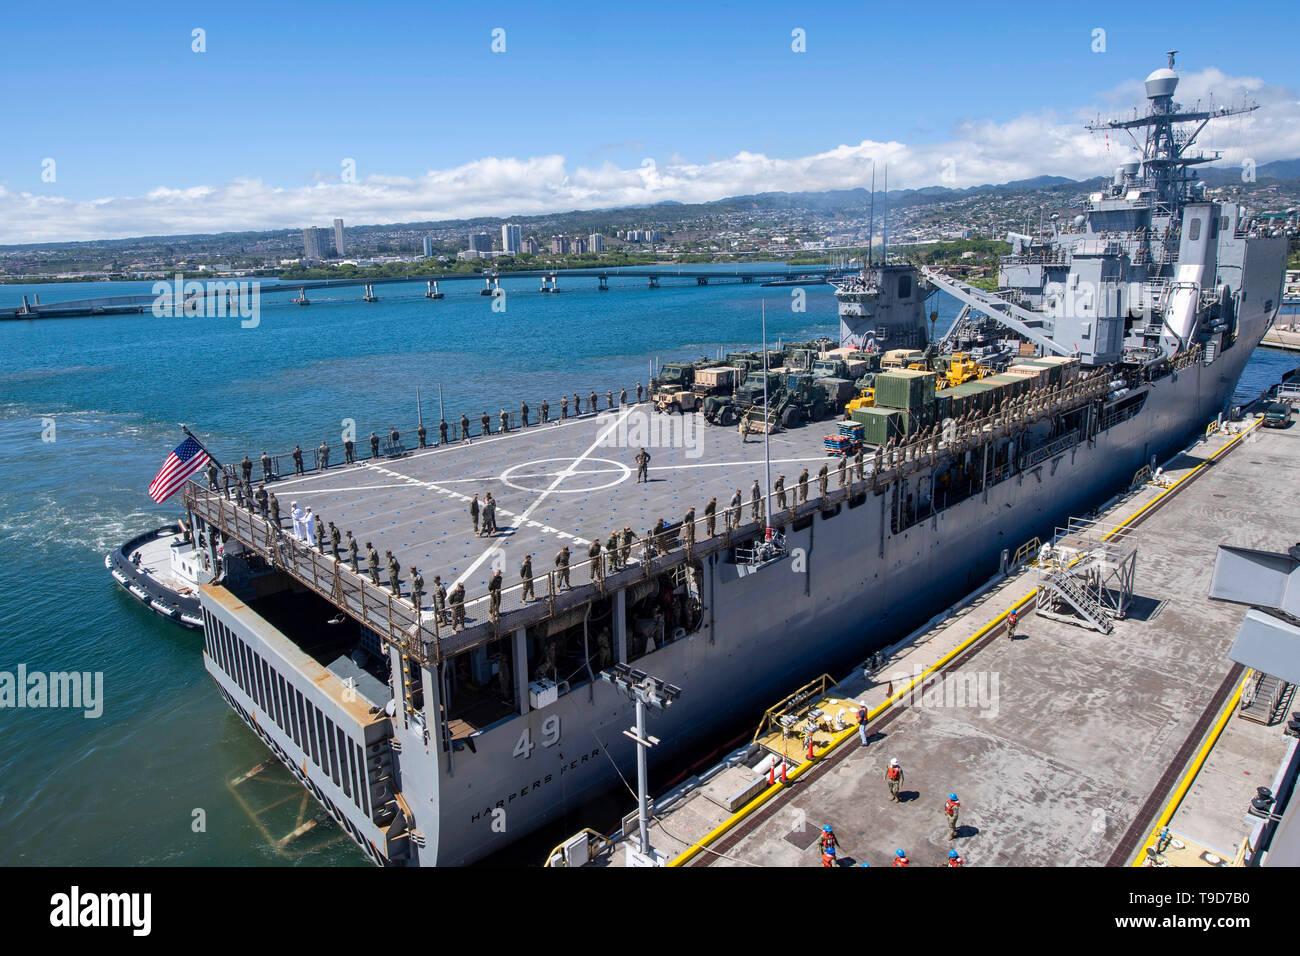 uss harpers ferry lsd 49 stock photos  u0026 uss harpers ferry lsd 49 stock images